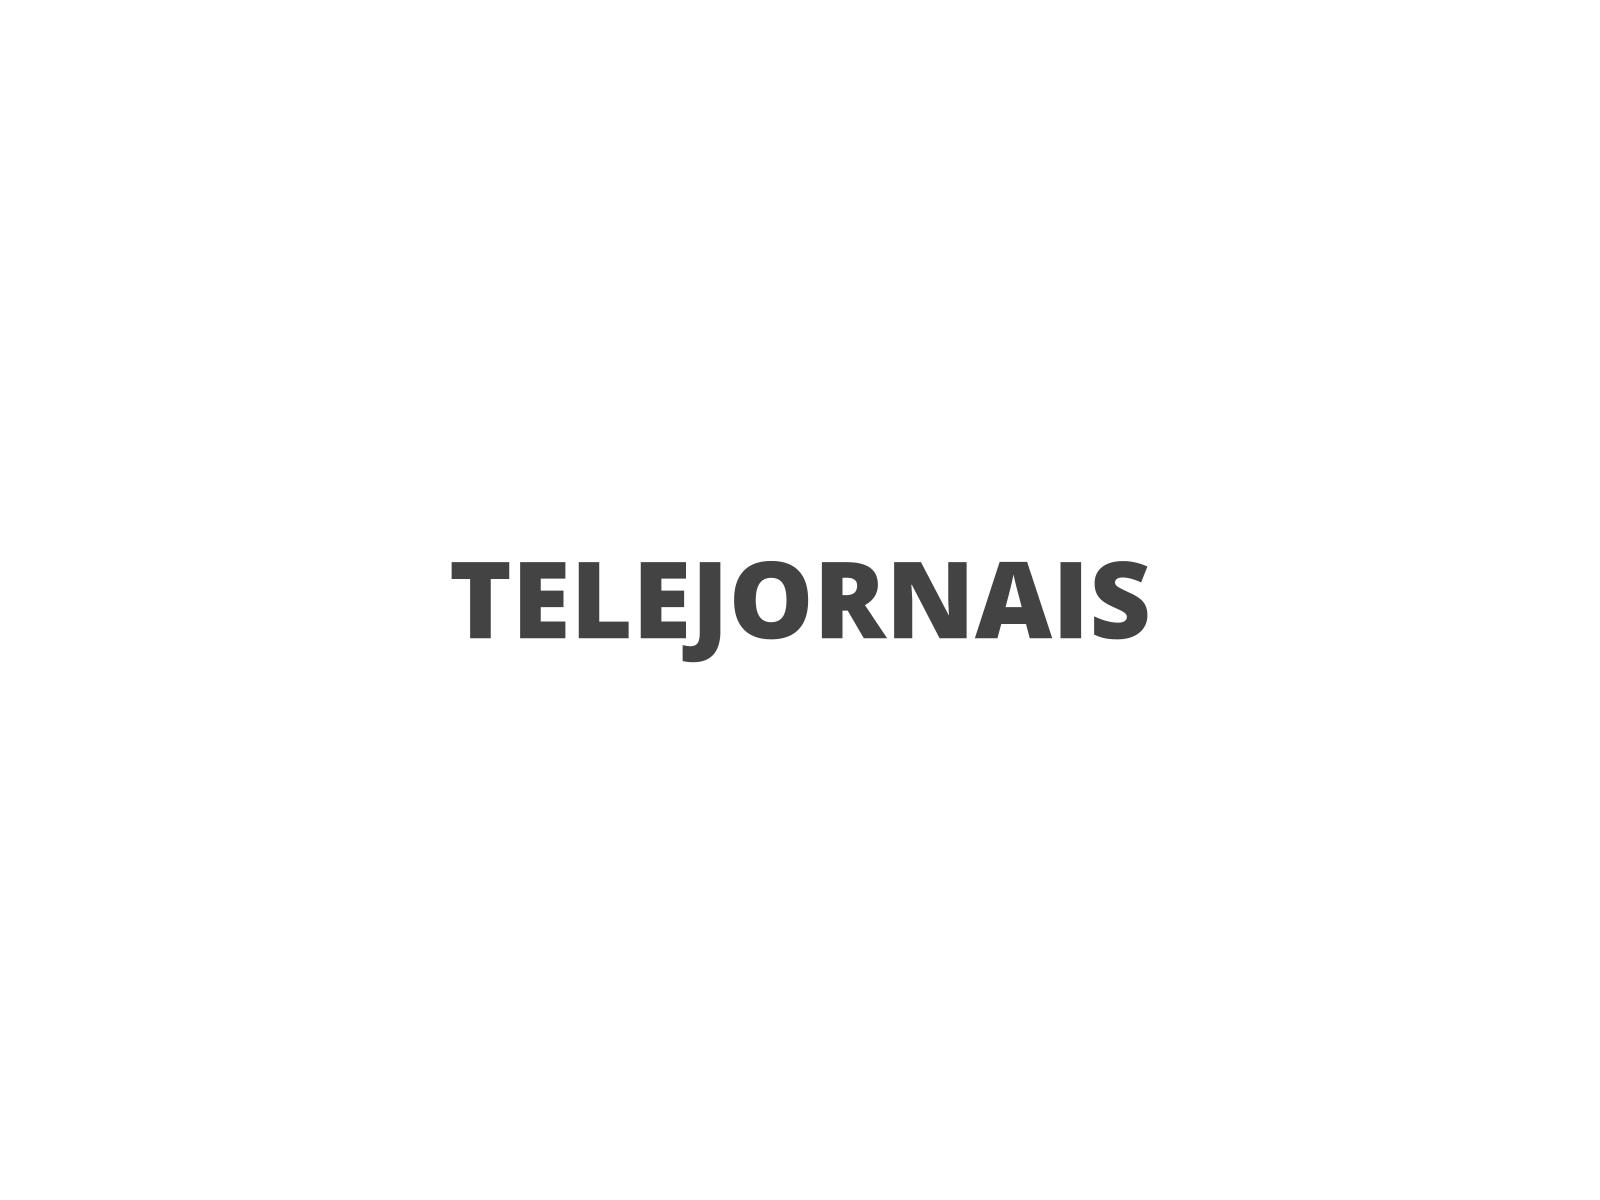 Telejornais